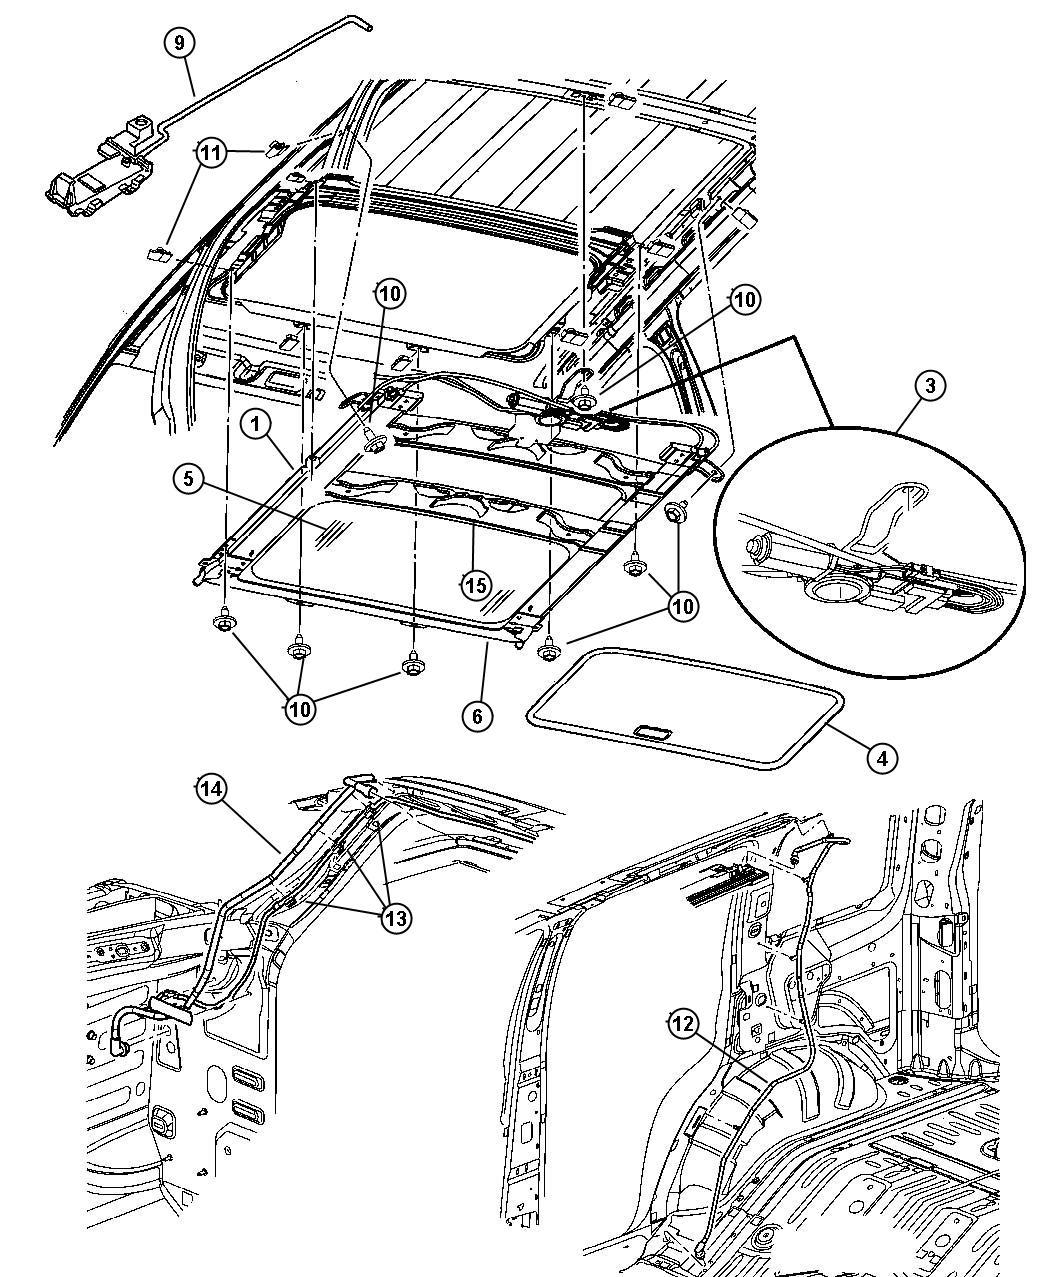 2006 jeep liberty crd wiring diagram